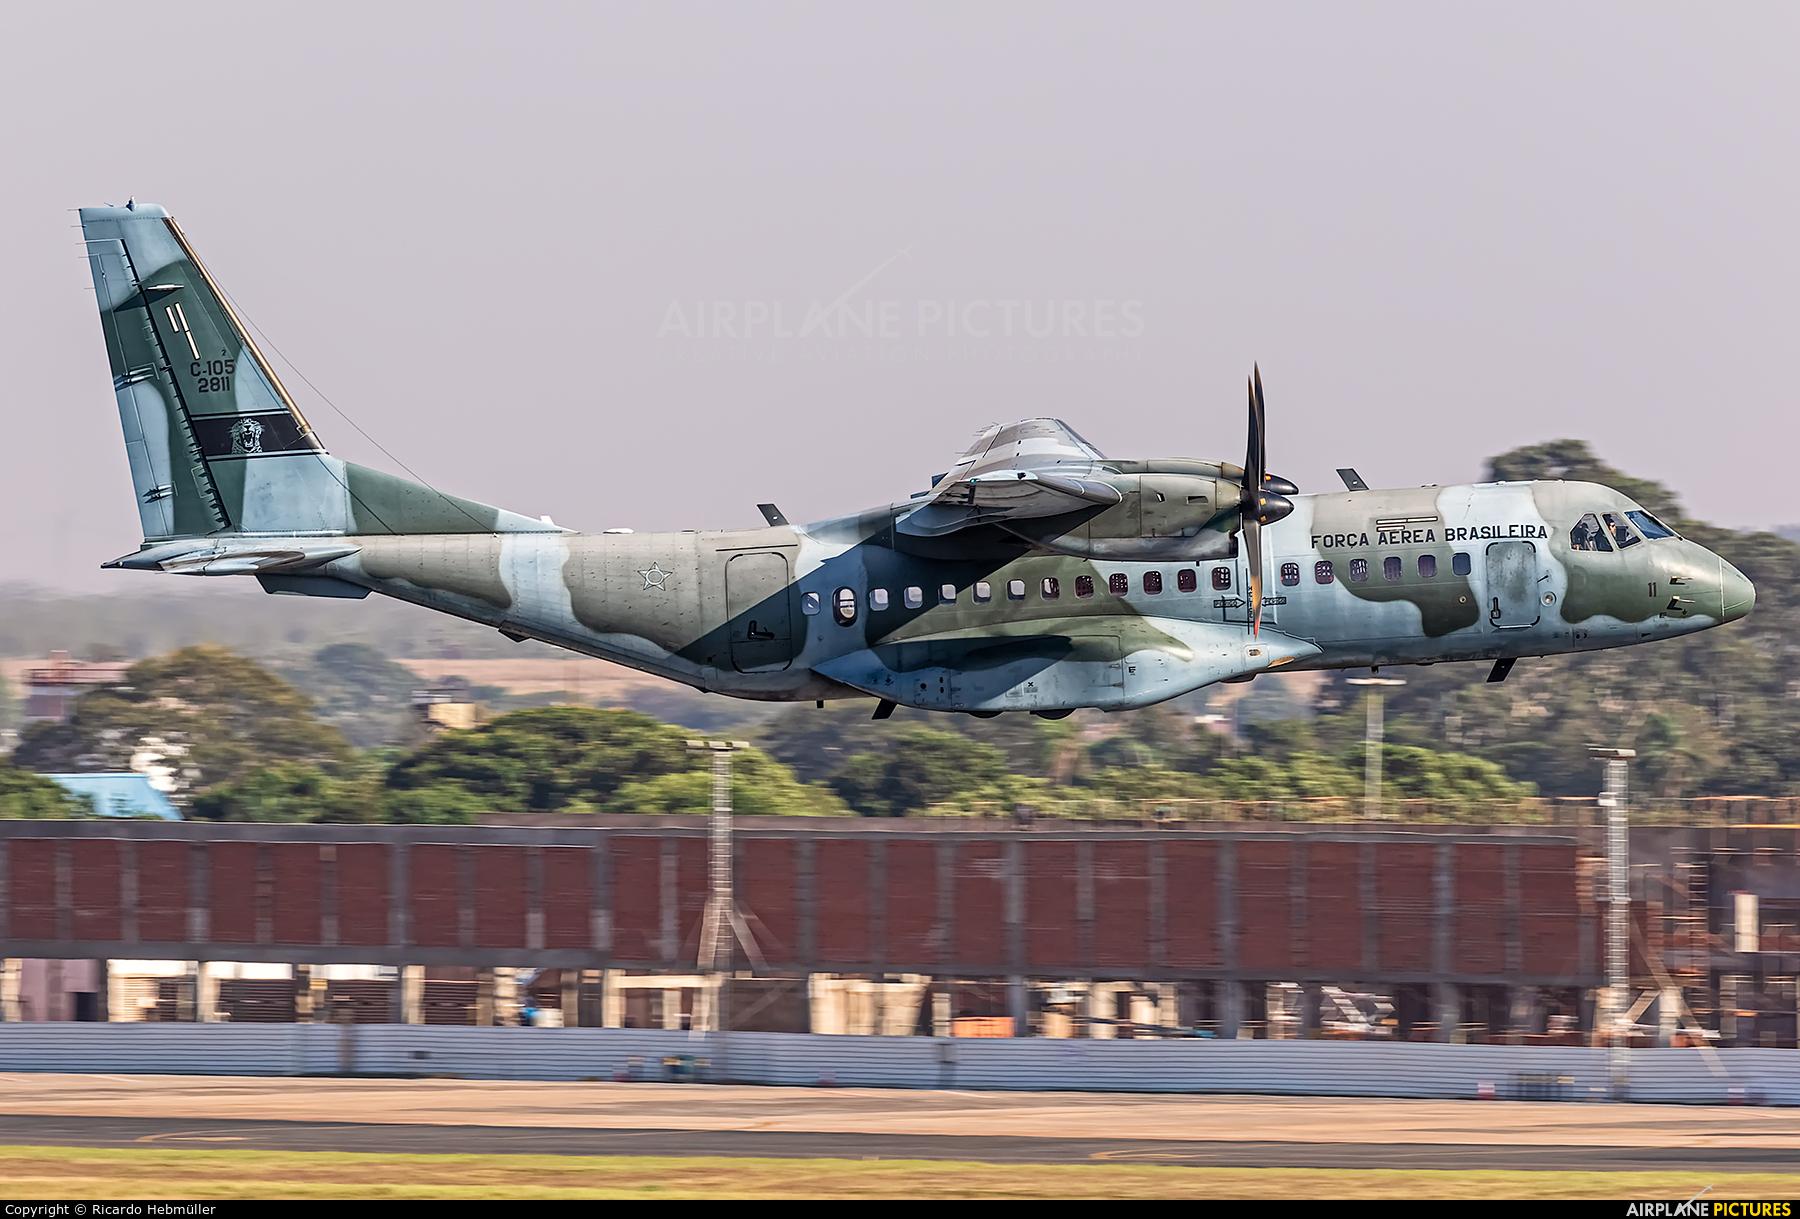 Brazil - Air Force 2811 aircraft at Campo Grande